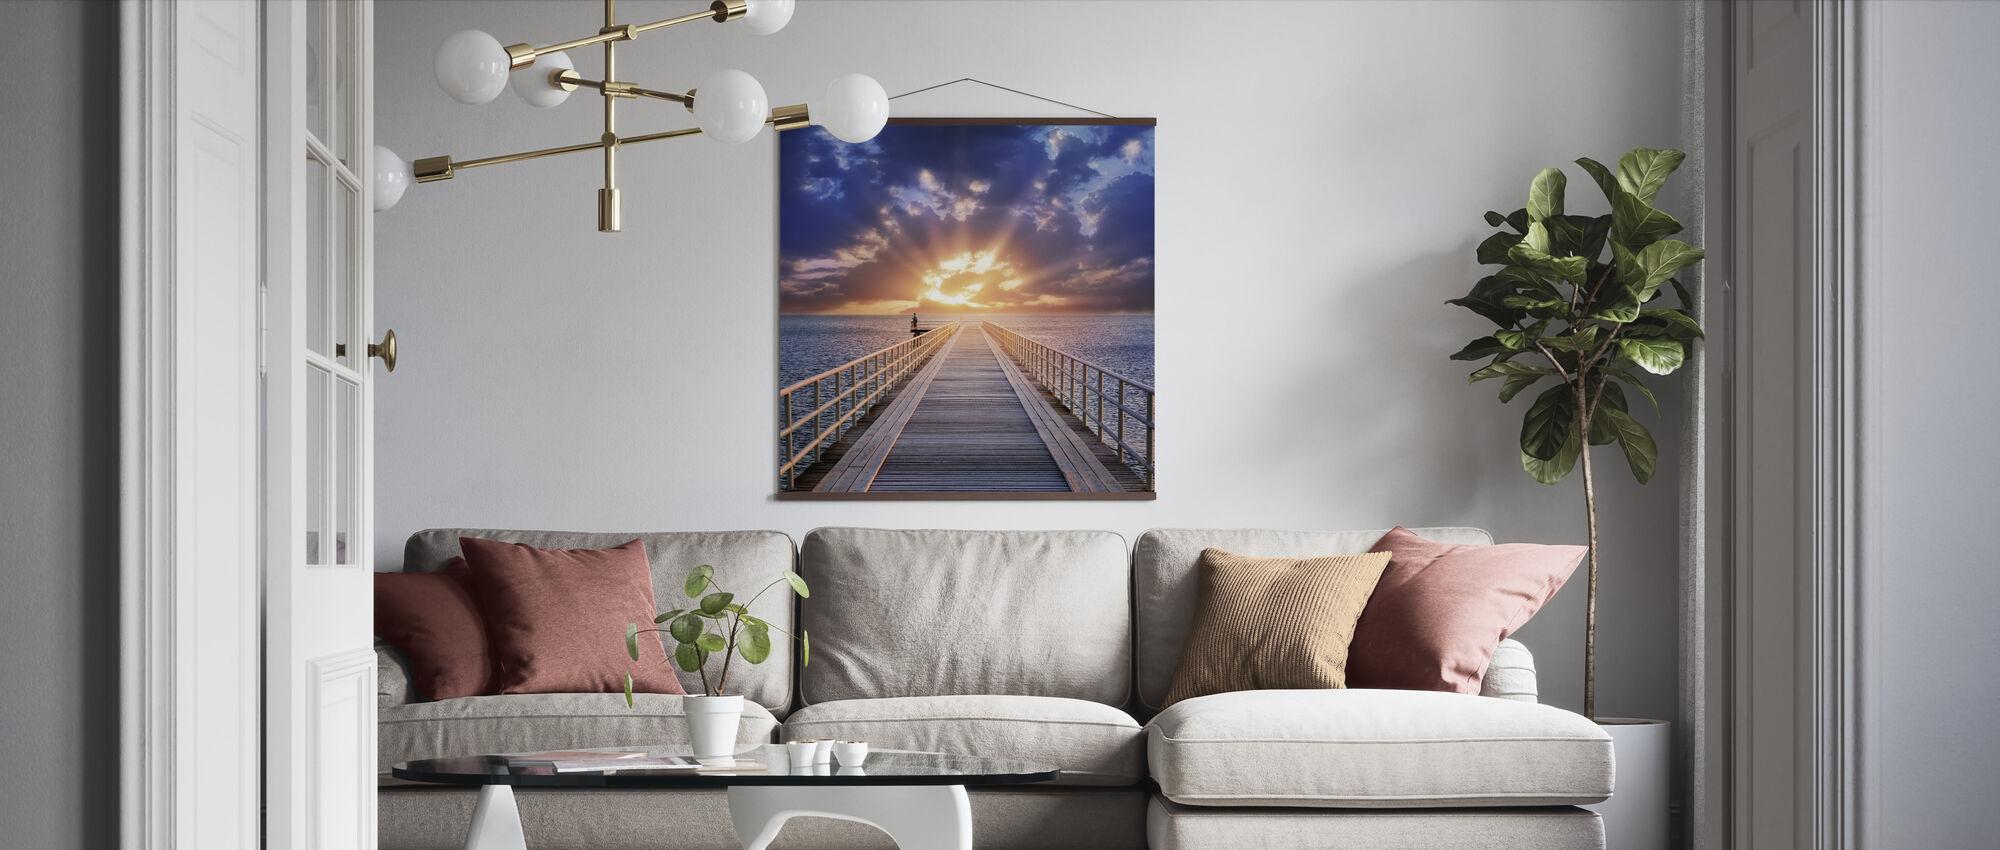 Backlight Bridge - Poster - Living Room